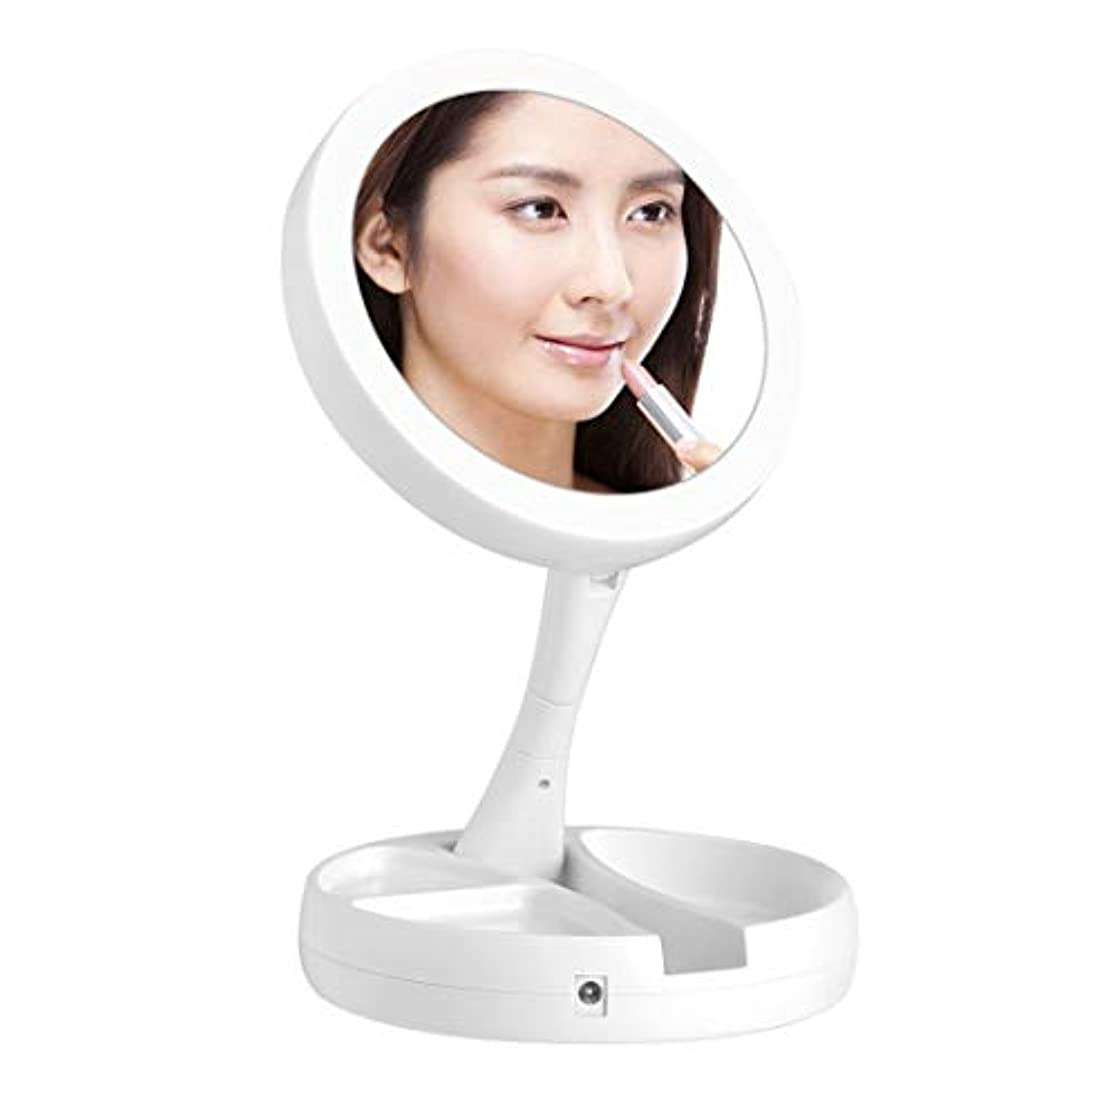 kamaa化粧鏡 化粧ミラー 女優ミラー LED両面鏡 鏡 10倍拡大鏡付き 折り畳み式 卓上 テーブルランプUSB/電池給電 180°回転